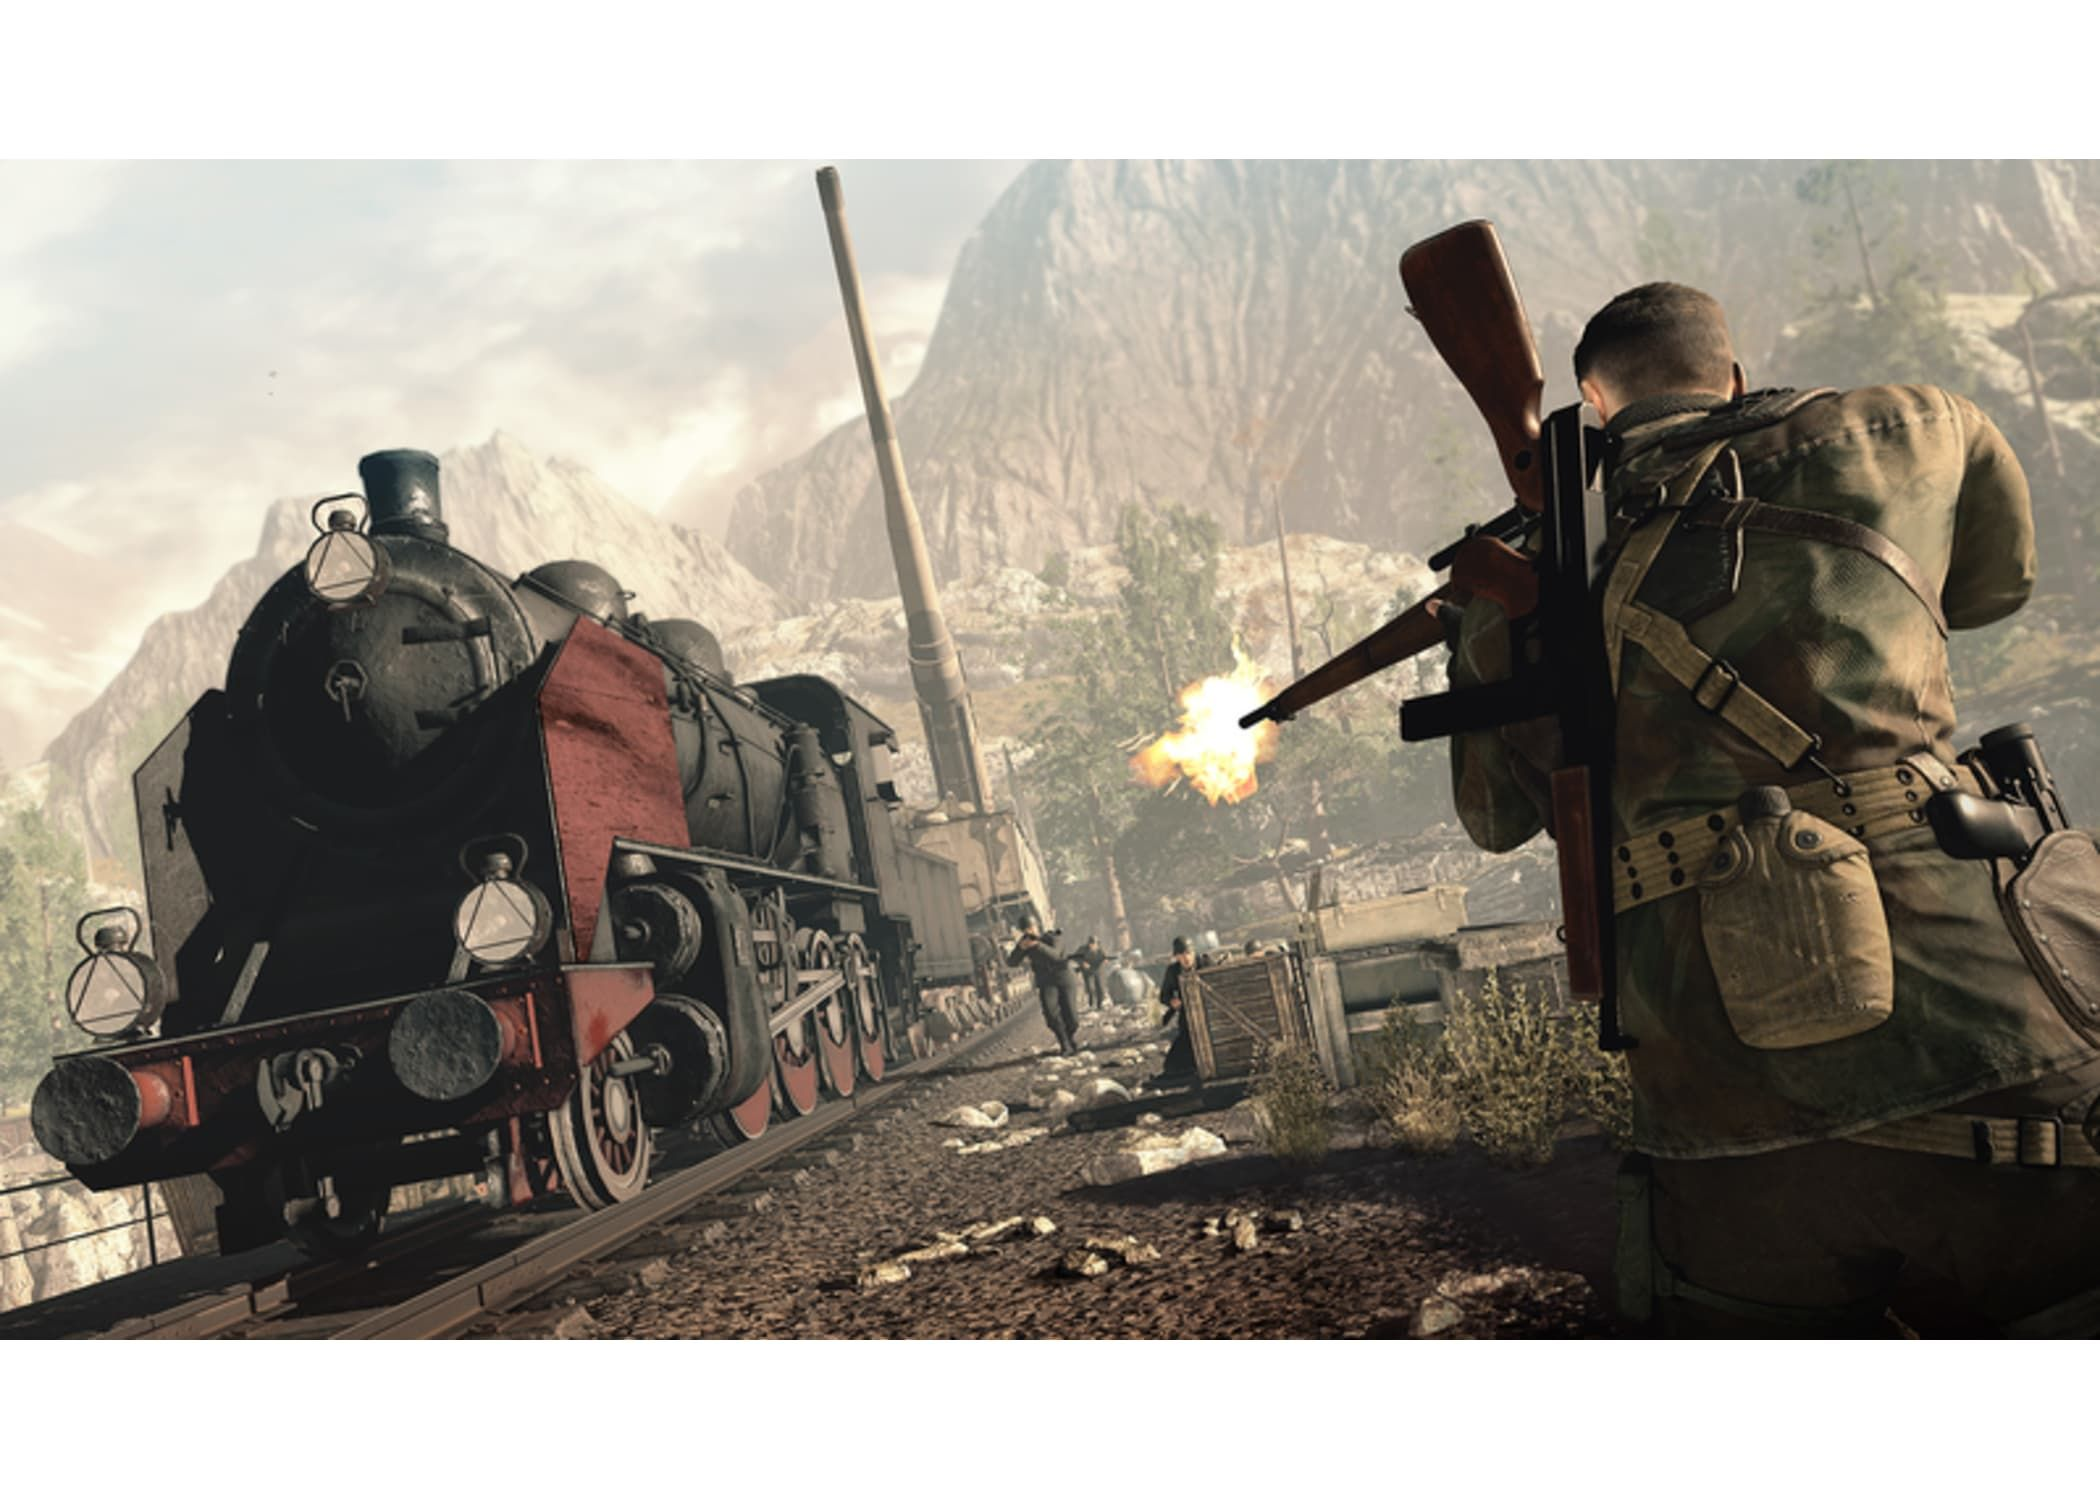 Buy Sniper Elite 4 Limited Edition on PlayStation 4  GAME #Affiliate , #Ad, #Elite, #Sniper, #Buy, #Limited, #GAME